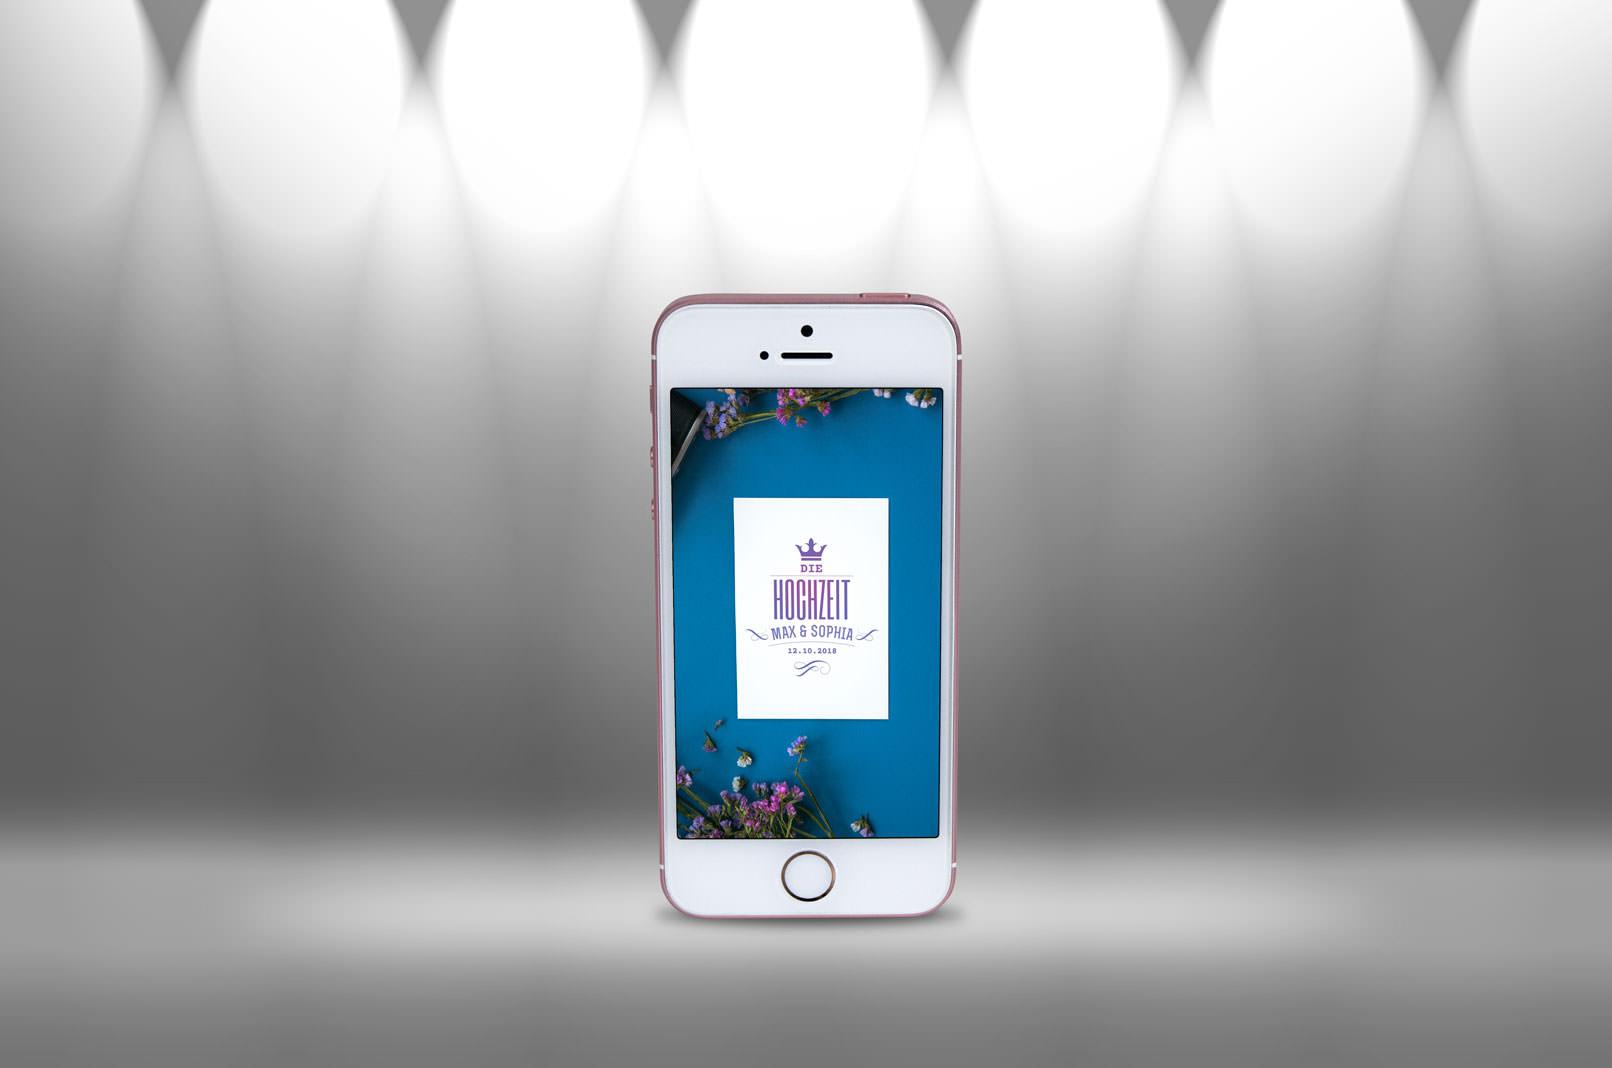 Spotlight-Bild mit Smartphone